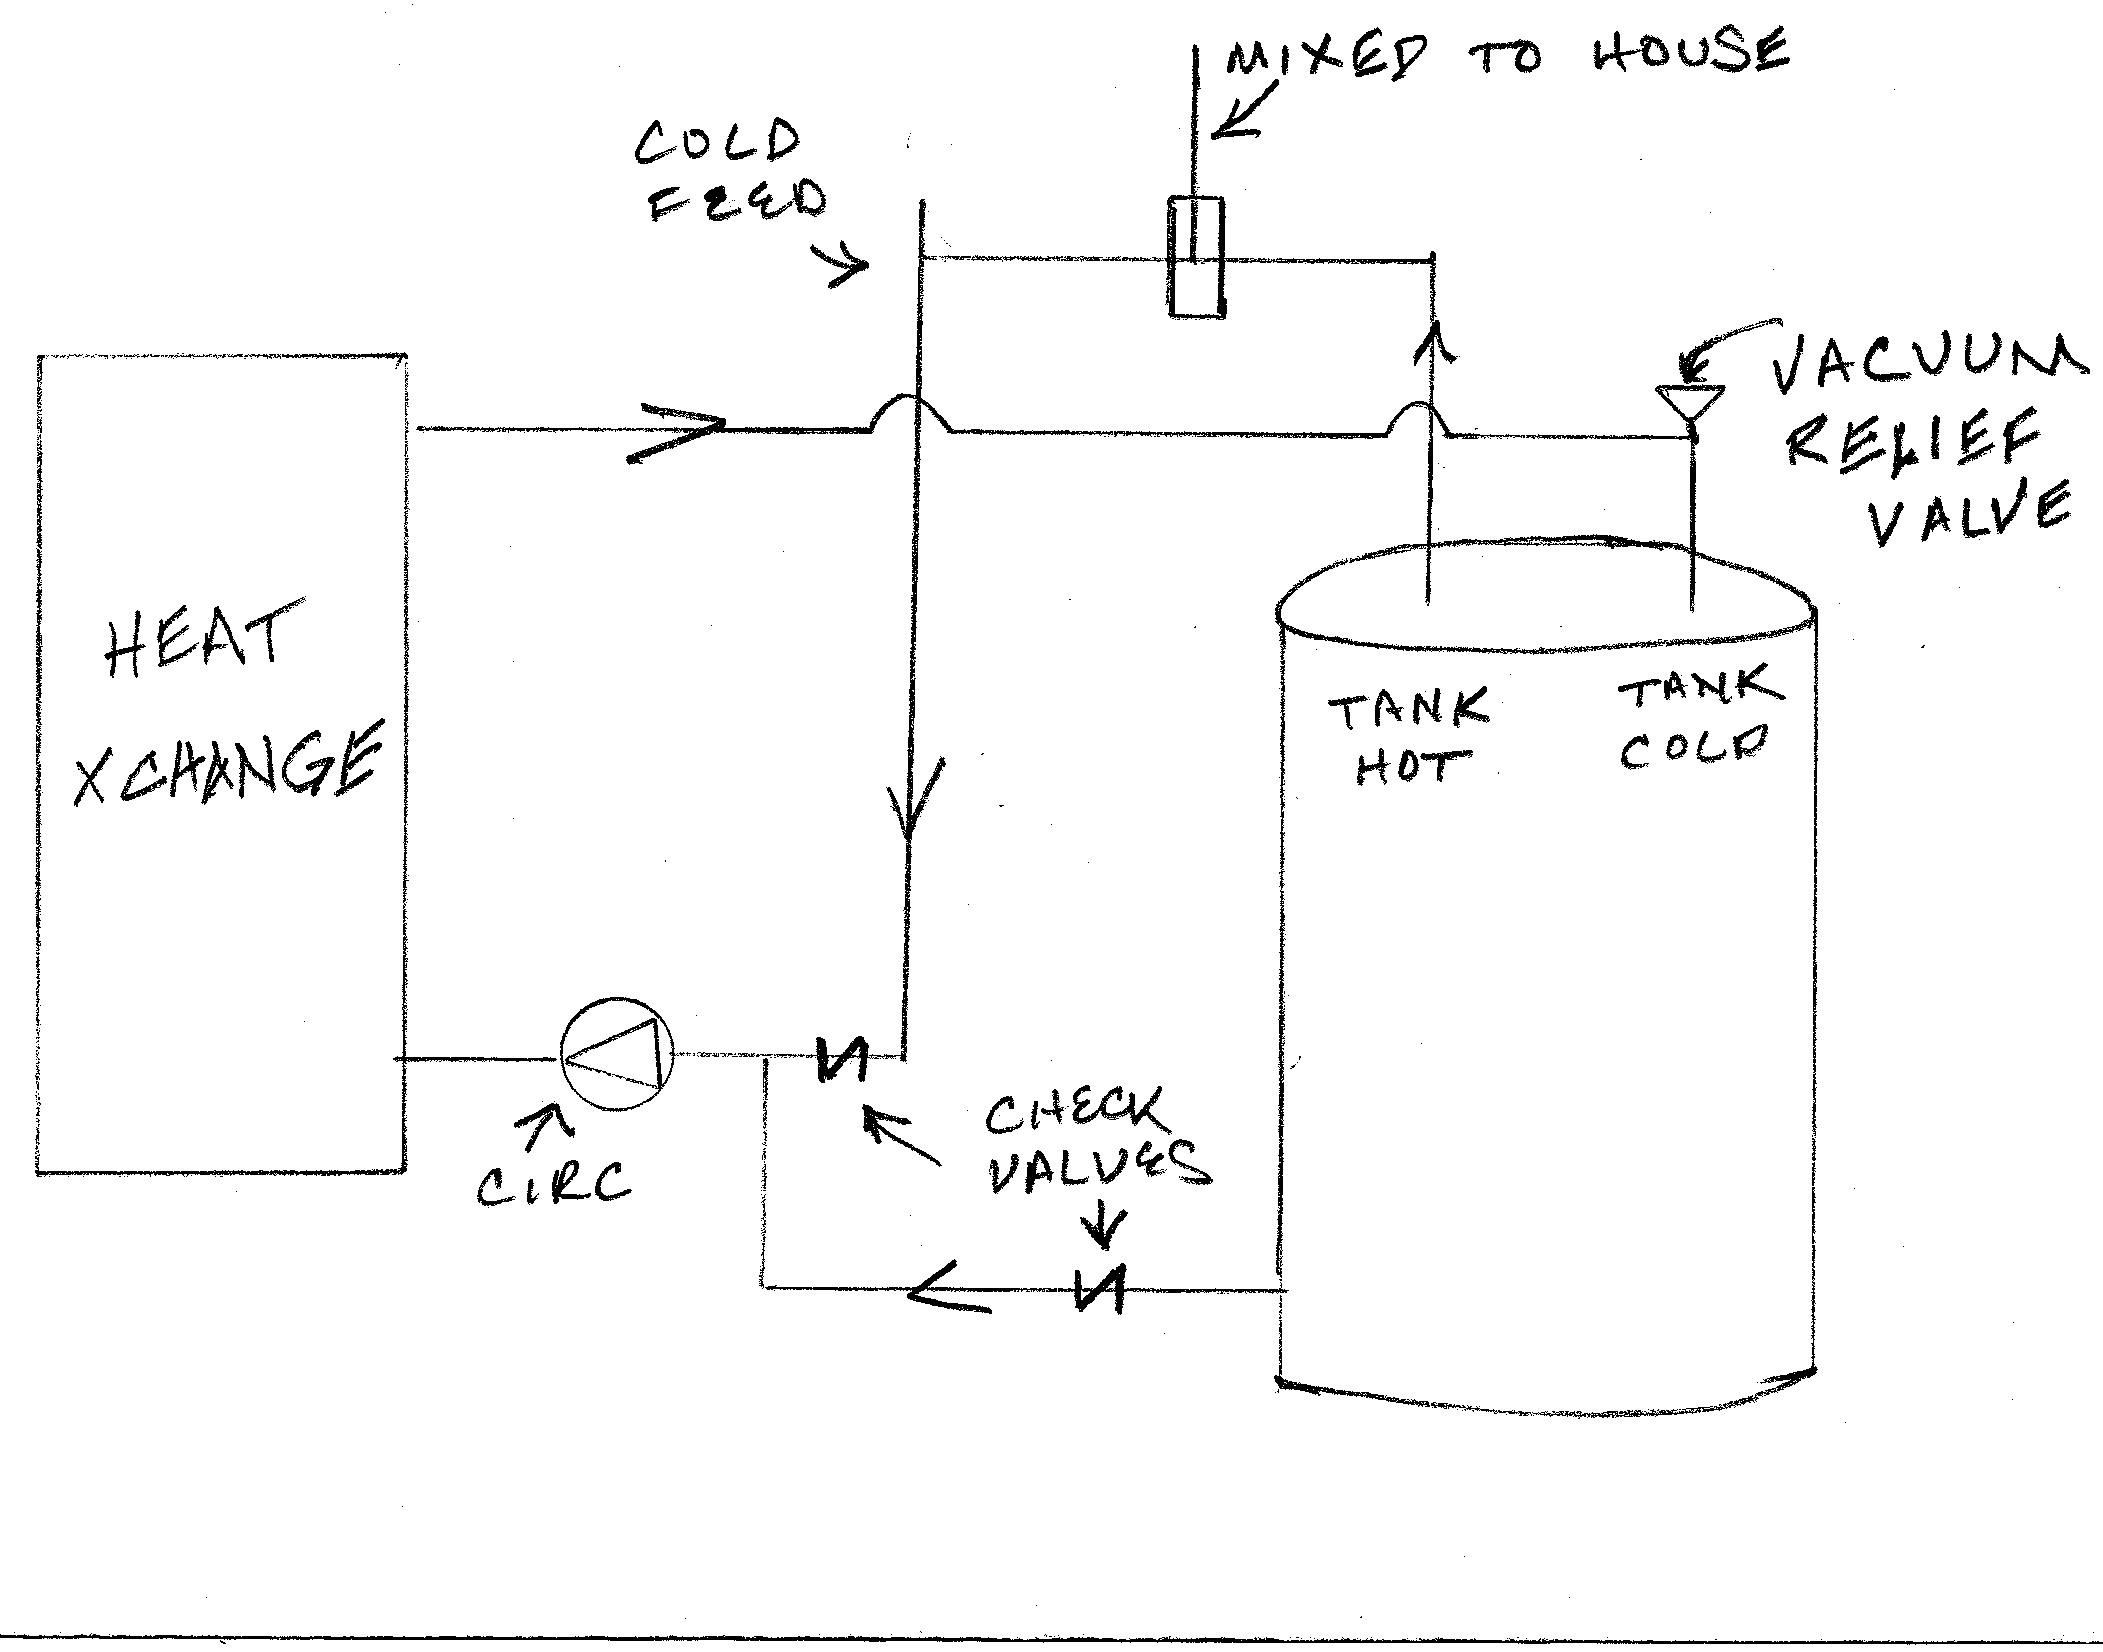 tank piping diagram 28 images single and fuel tank piping rh gelasplastik ml Gas Hot Water Tank Diagram Water Tank Plumbing Diagram